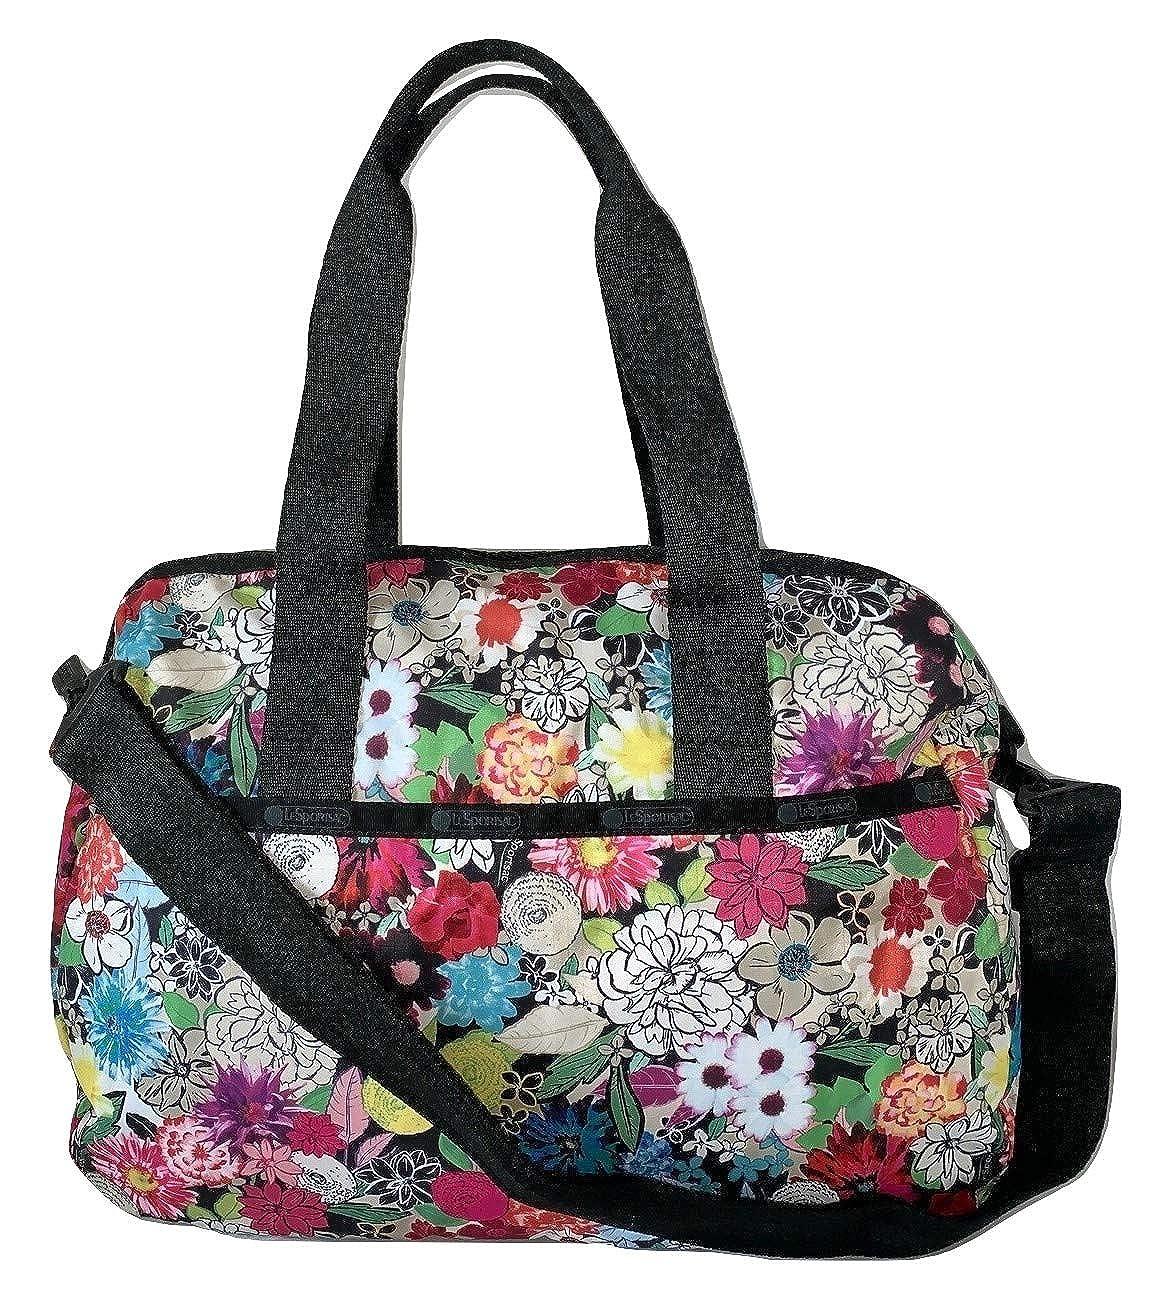 LeSportsac Sunlight Floral Harper Congreenible Crossbody & Top Handle Tote Handbag Carryon, Style 3356 color E141